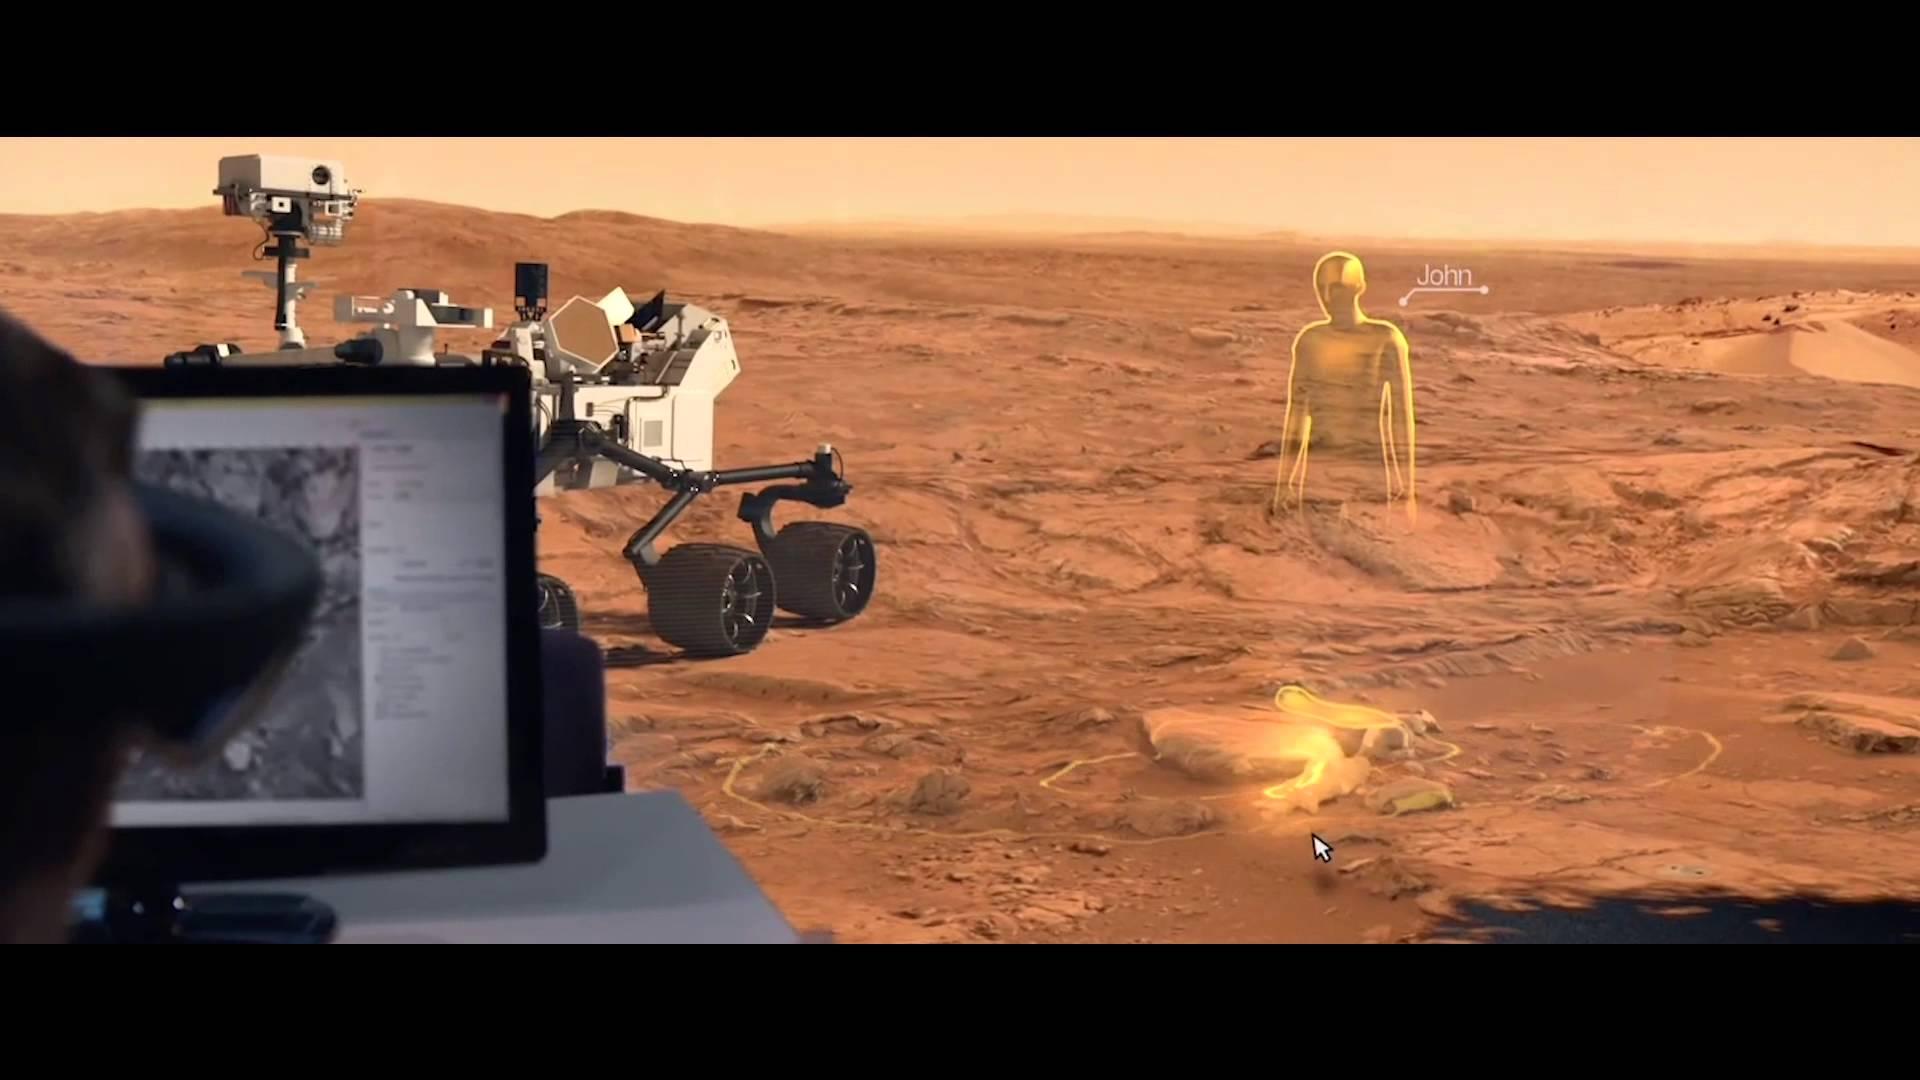 nasa using technology communication devices - photo #24